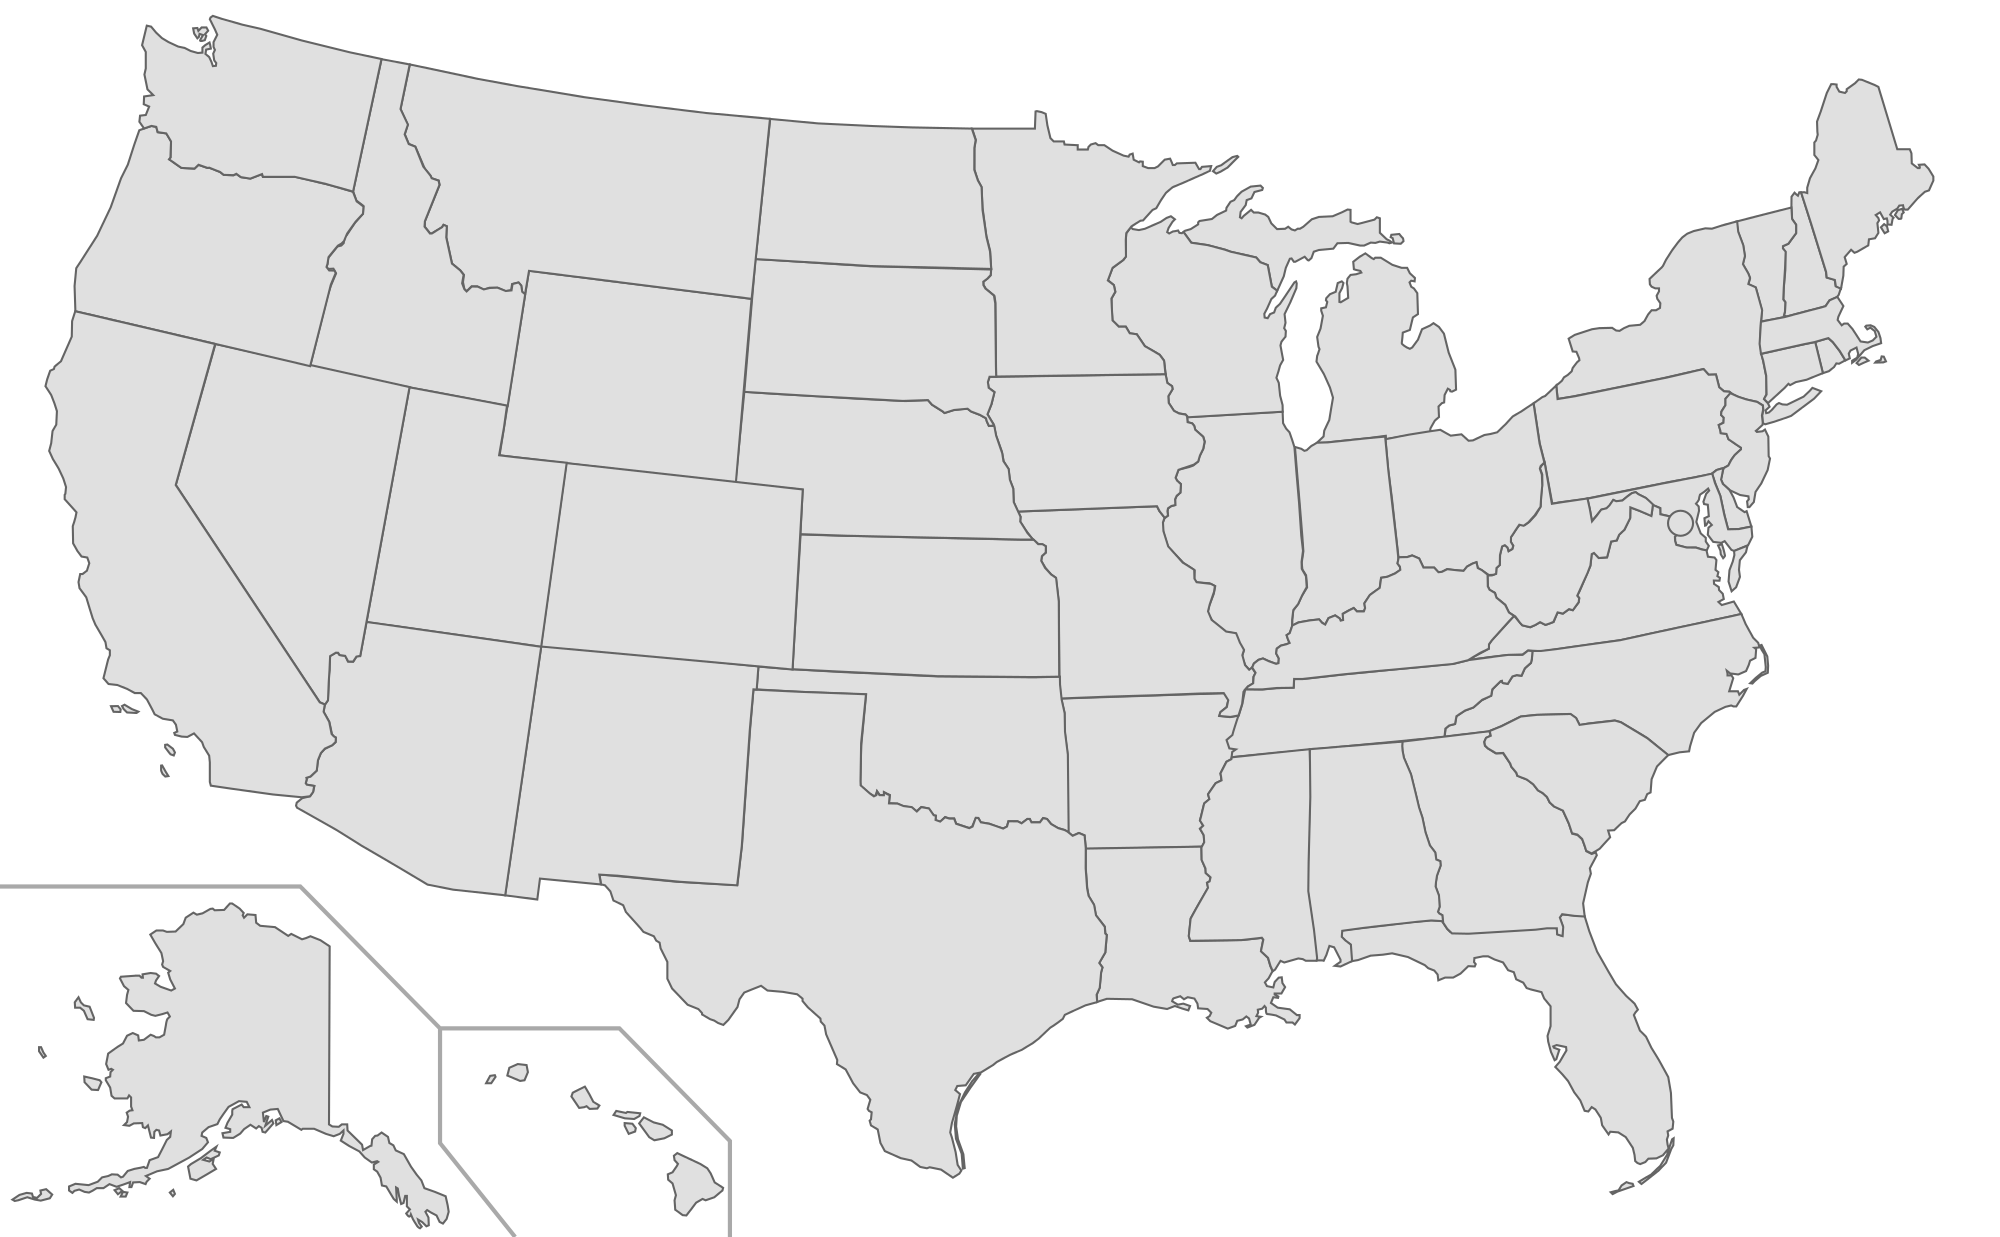 Transpatent cdoovision com places. Clipart map map road us